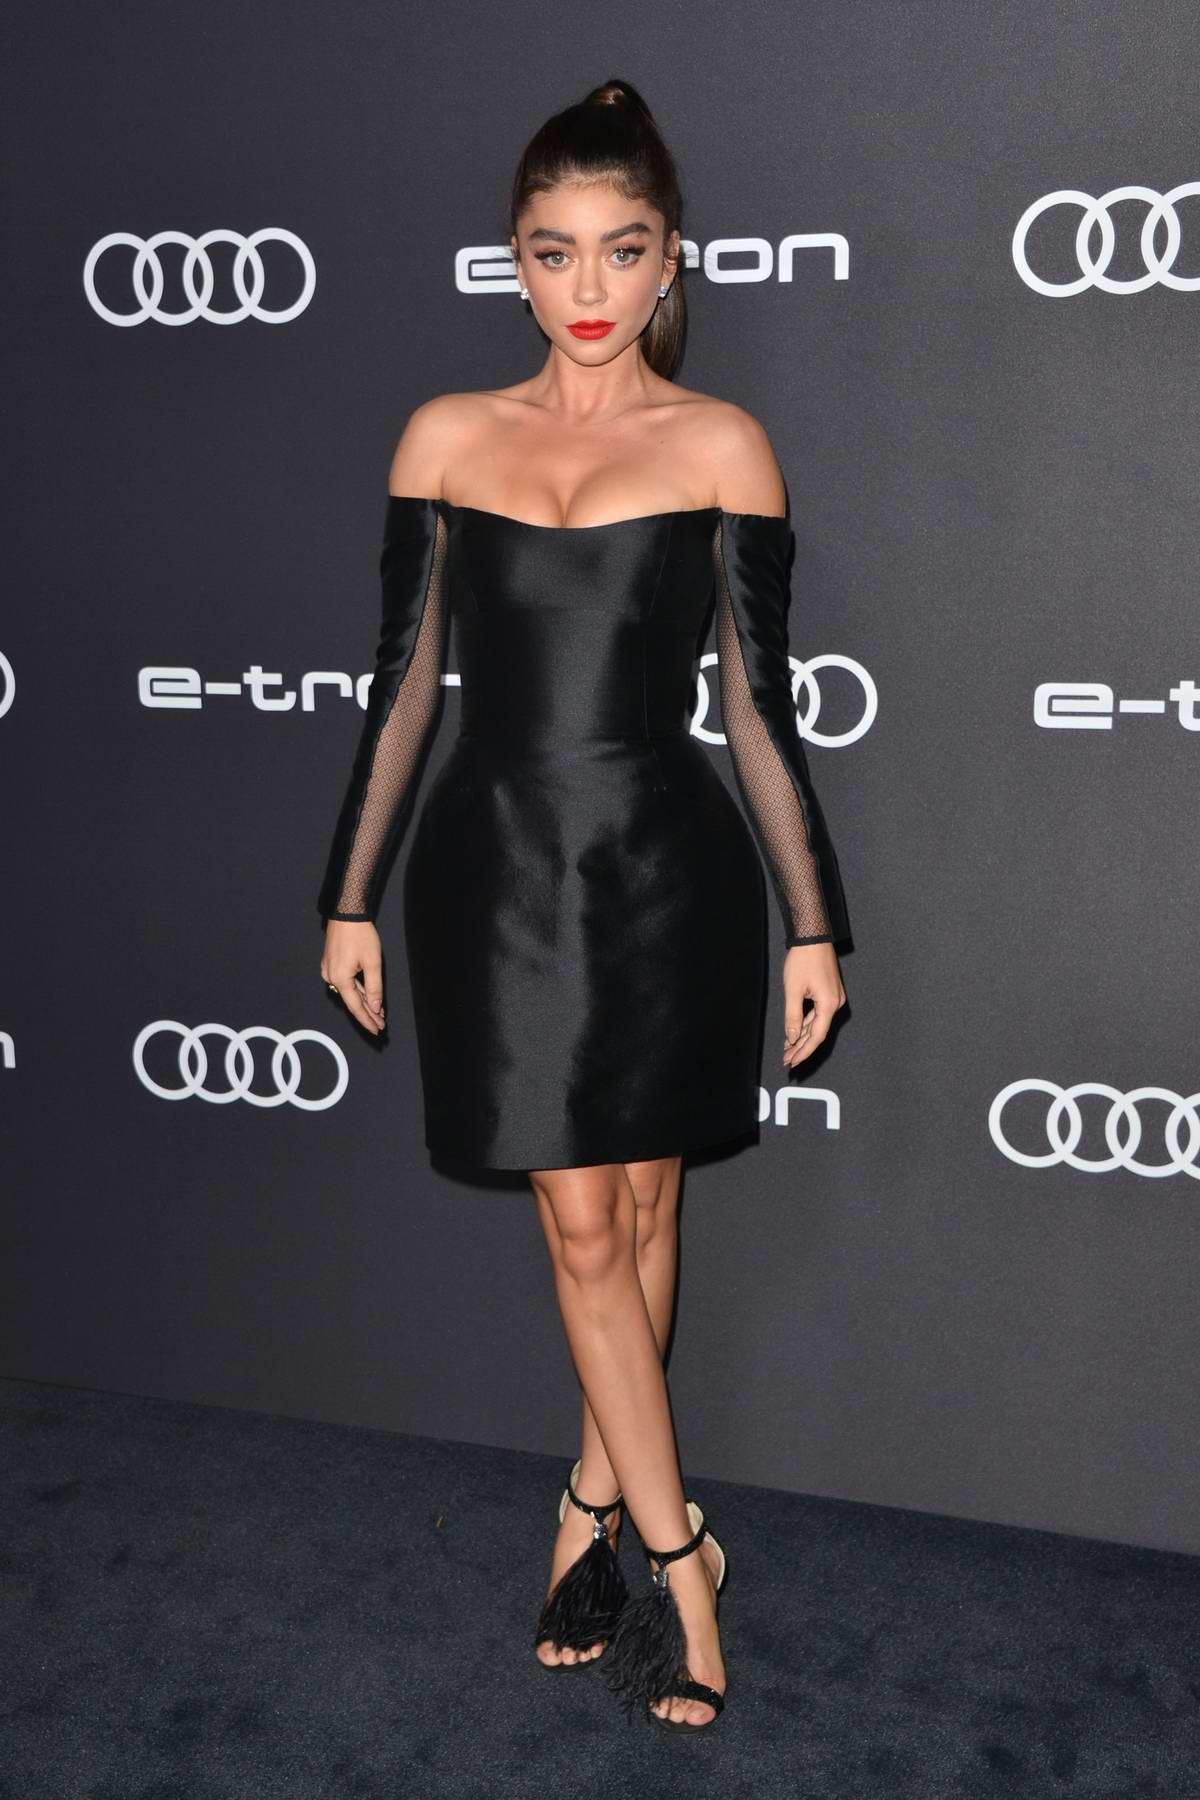 Sarah Hyland attends Audi Pre-Emmy Celebration in West Hollywood, Los Angeles